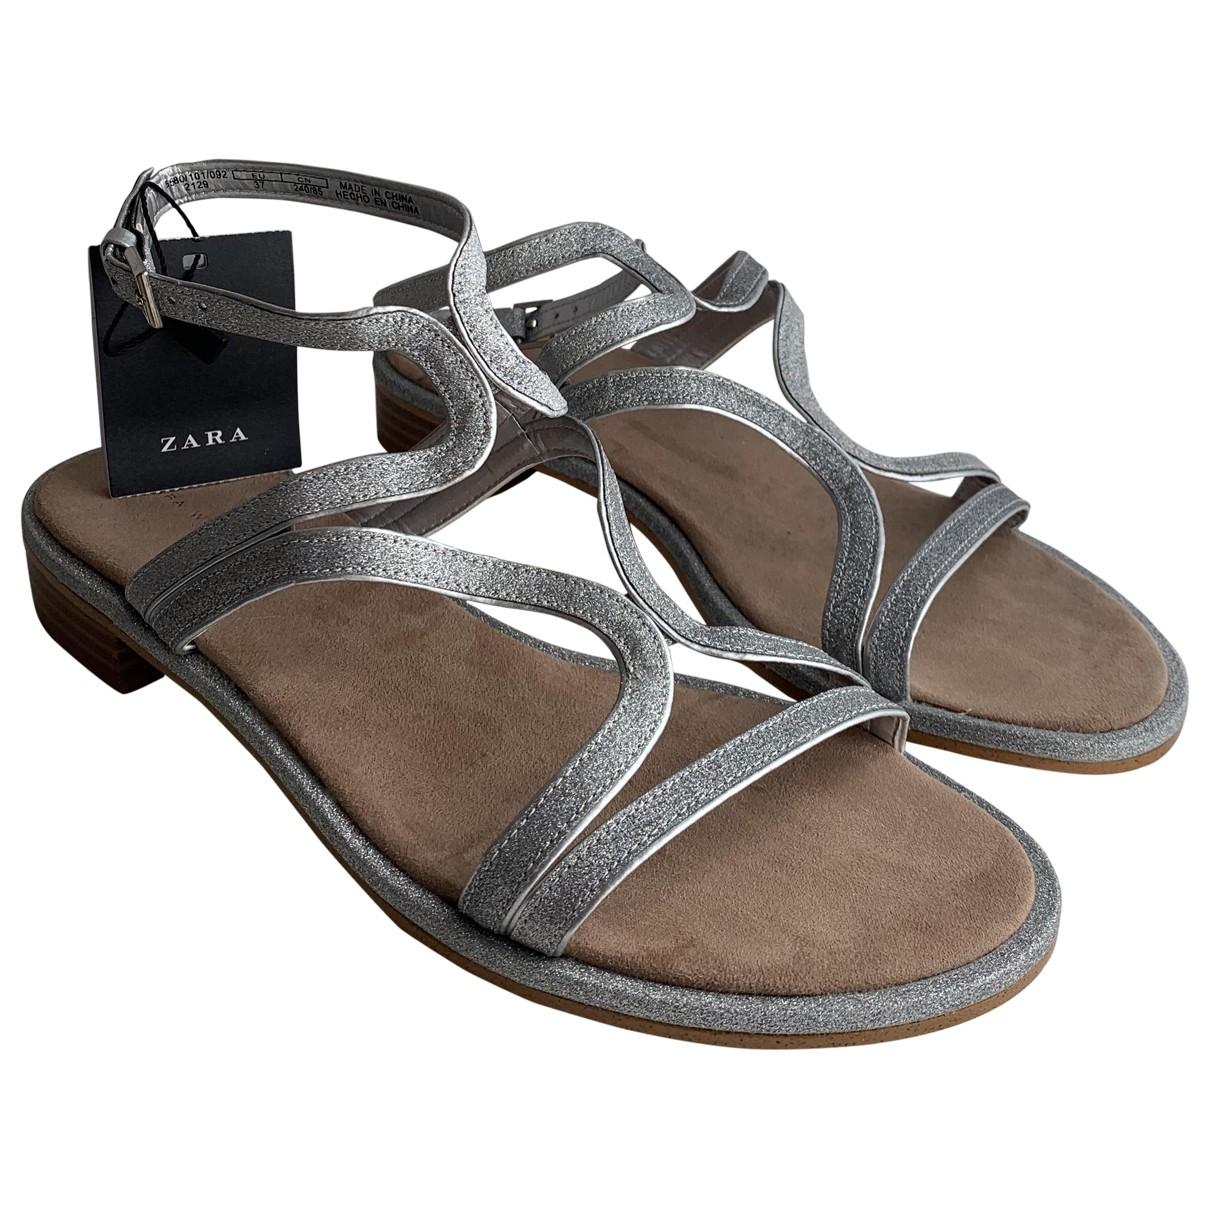 Zara \N Sandalen in  Silber Polyester